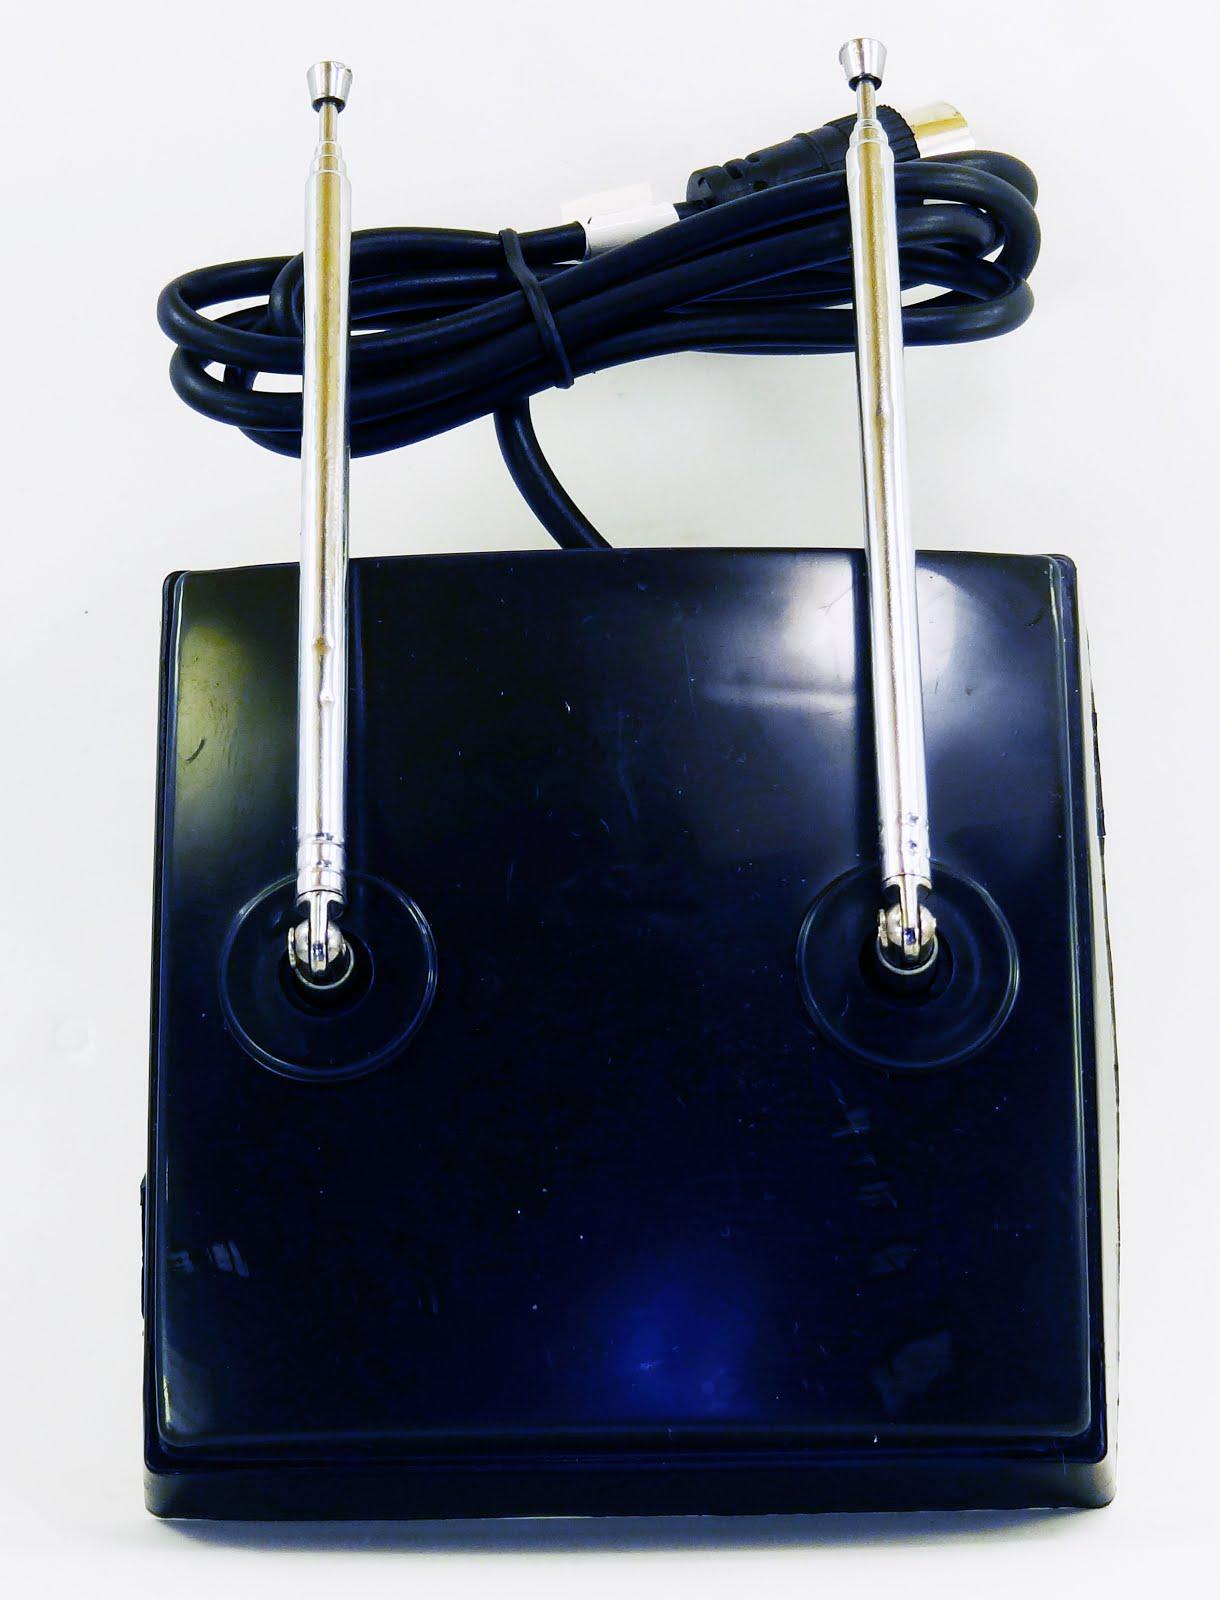 Review: RTL-SDR Blog Multipurpose Dipole Antenna Kit | Radio for